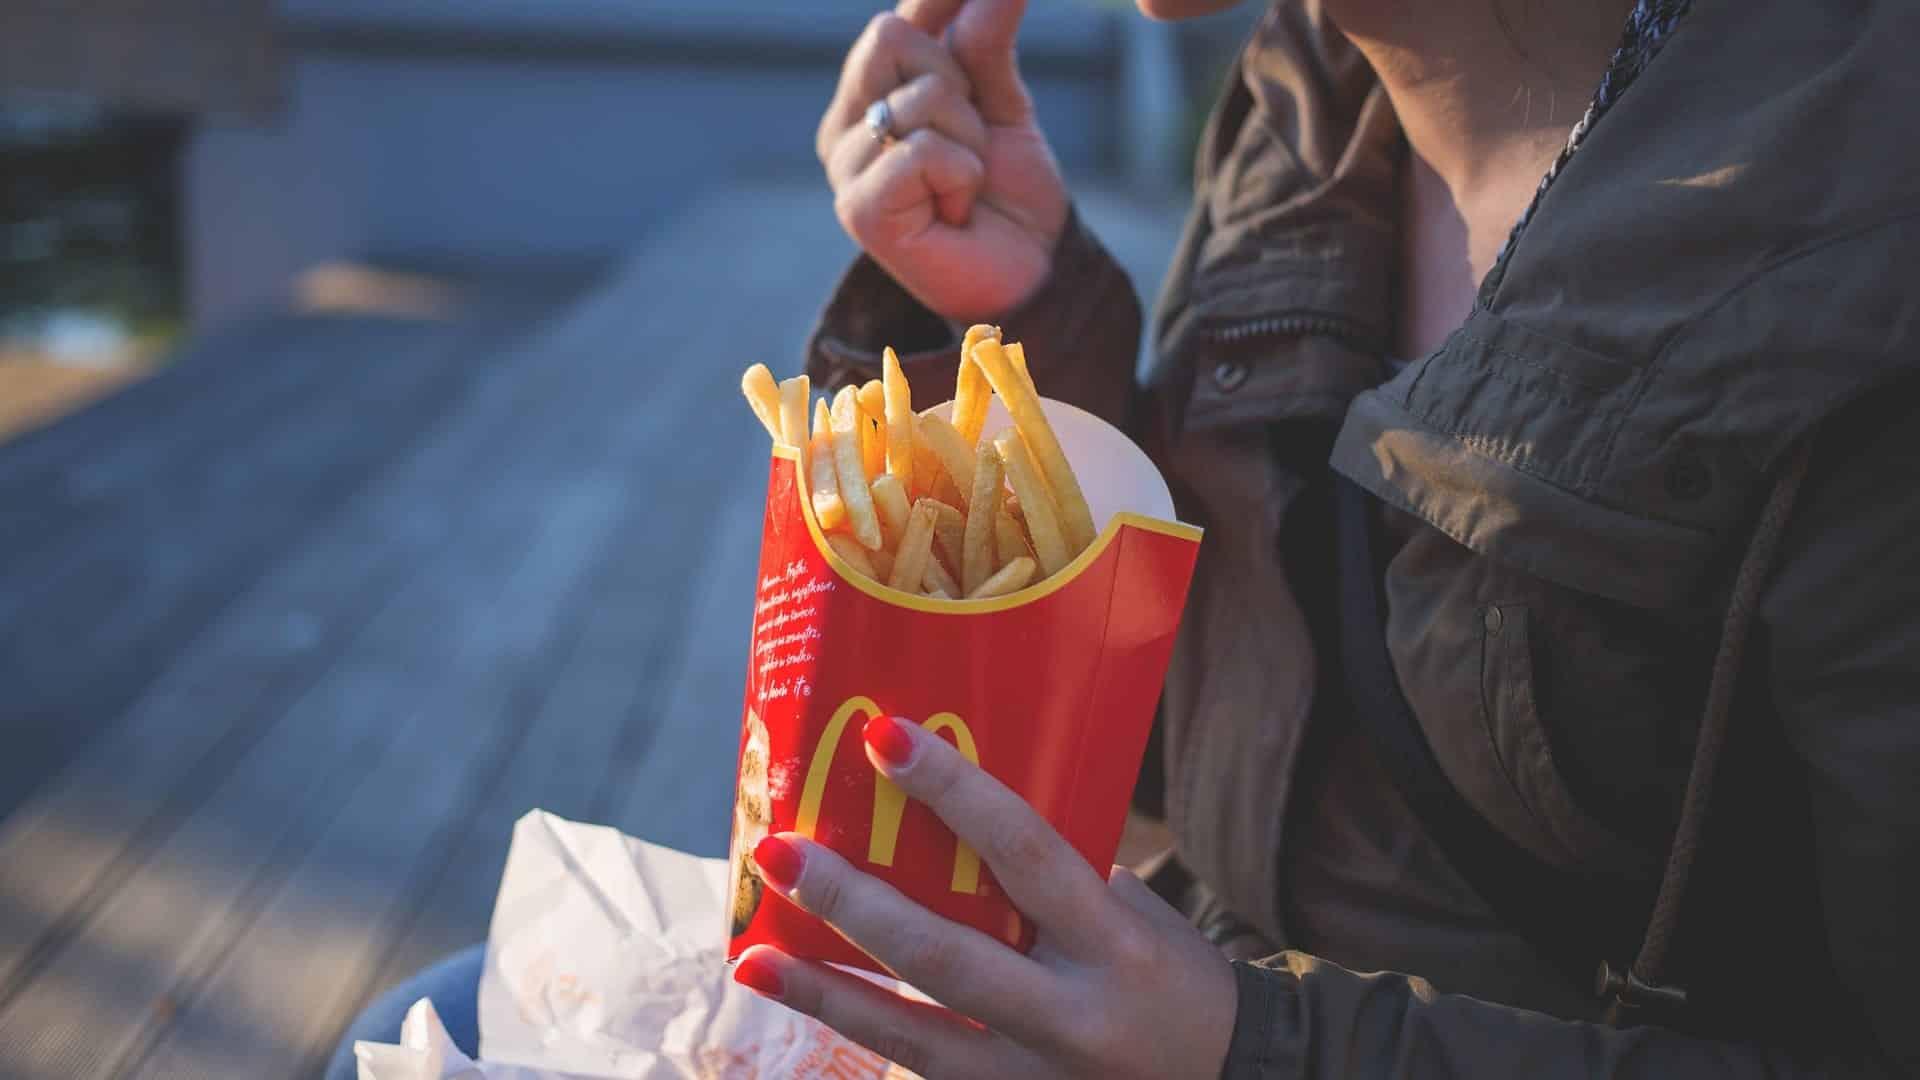 Lady eating Macdonalds Fries